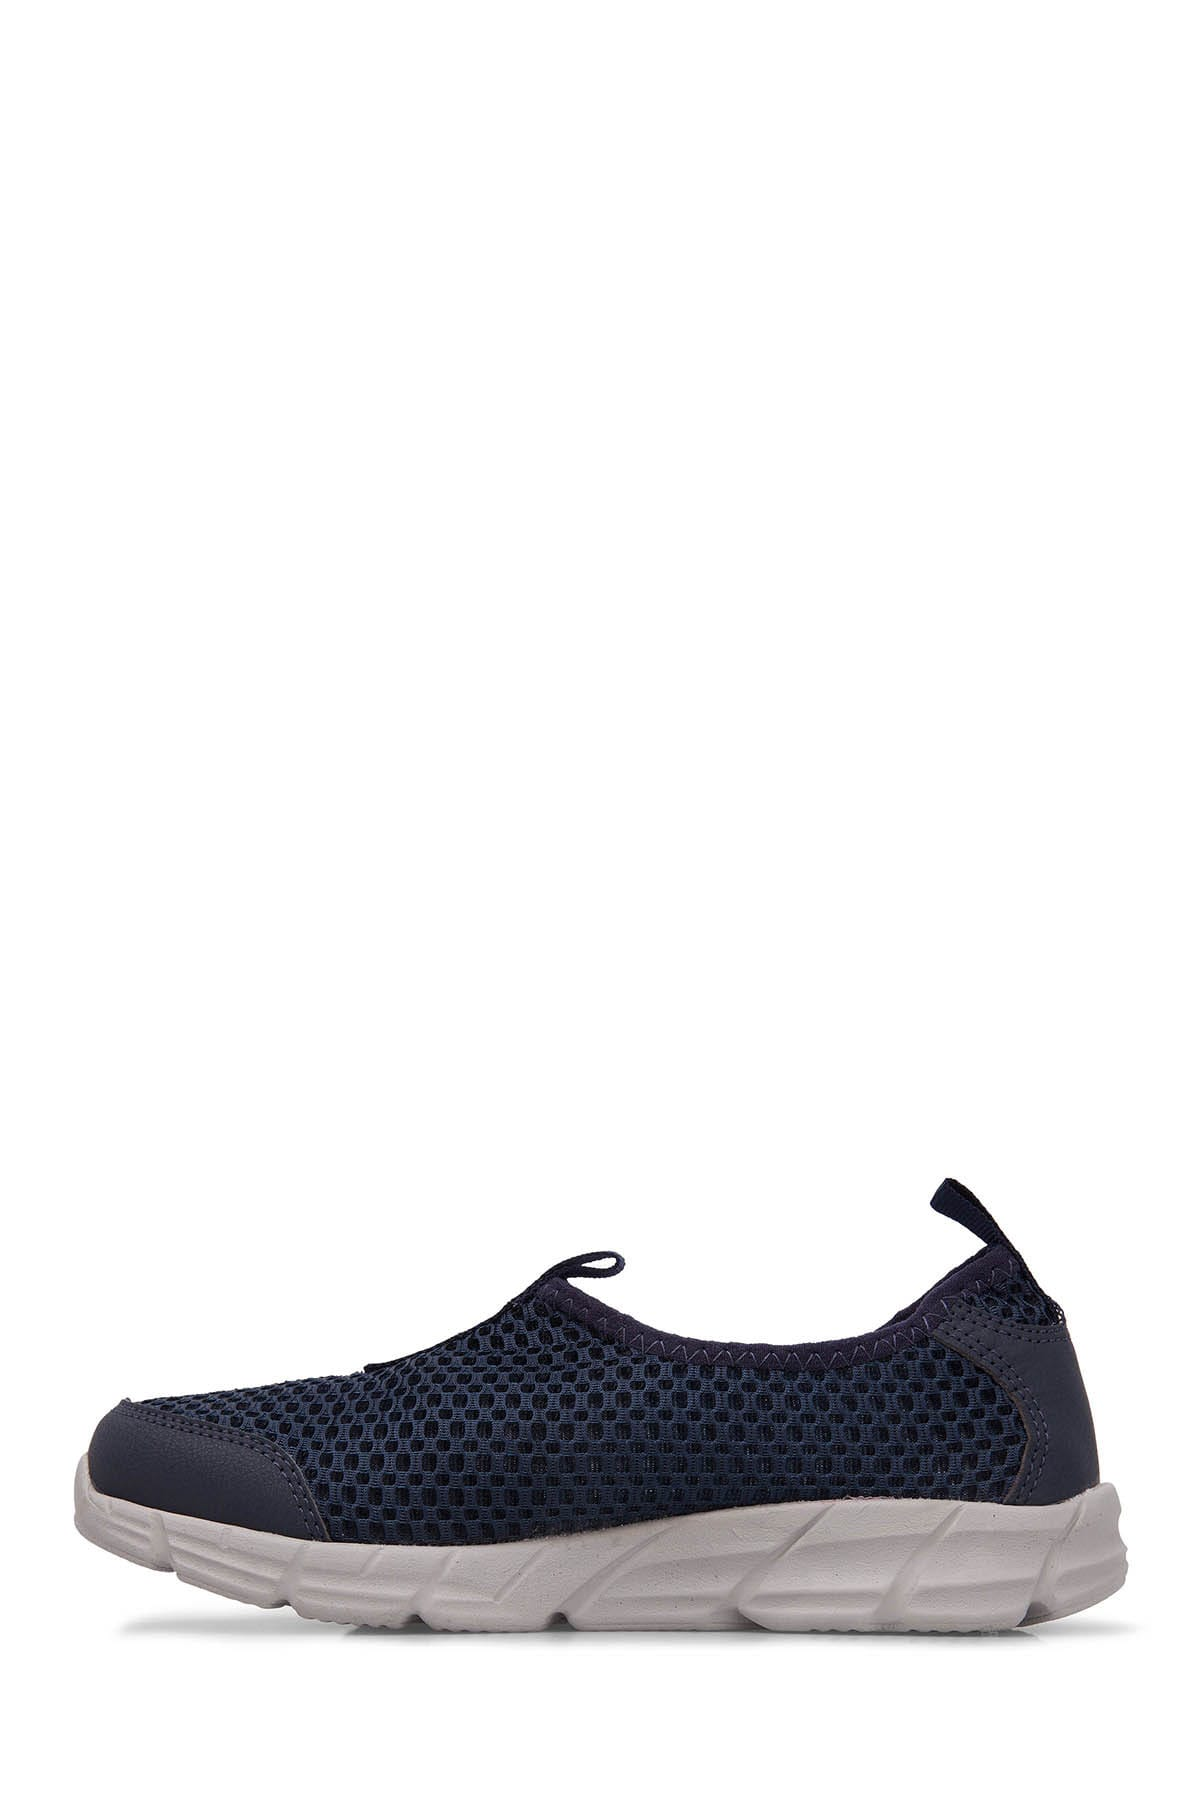 Scooter Lacivert Kadın Sneaker G5435 2